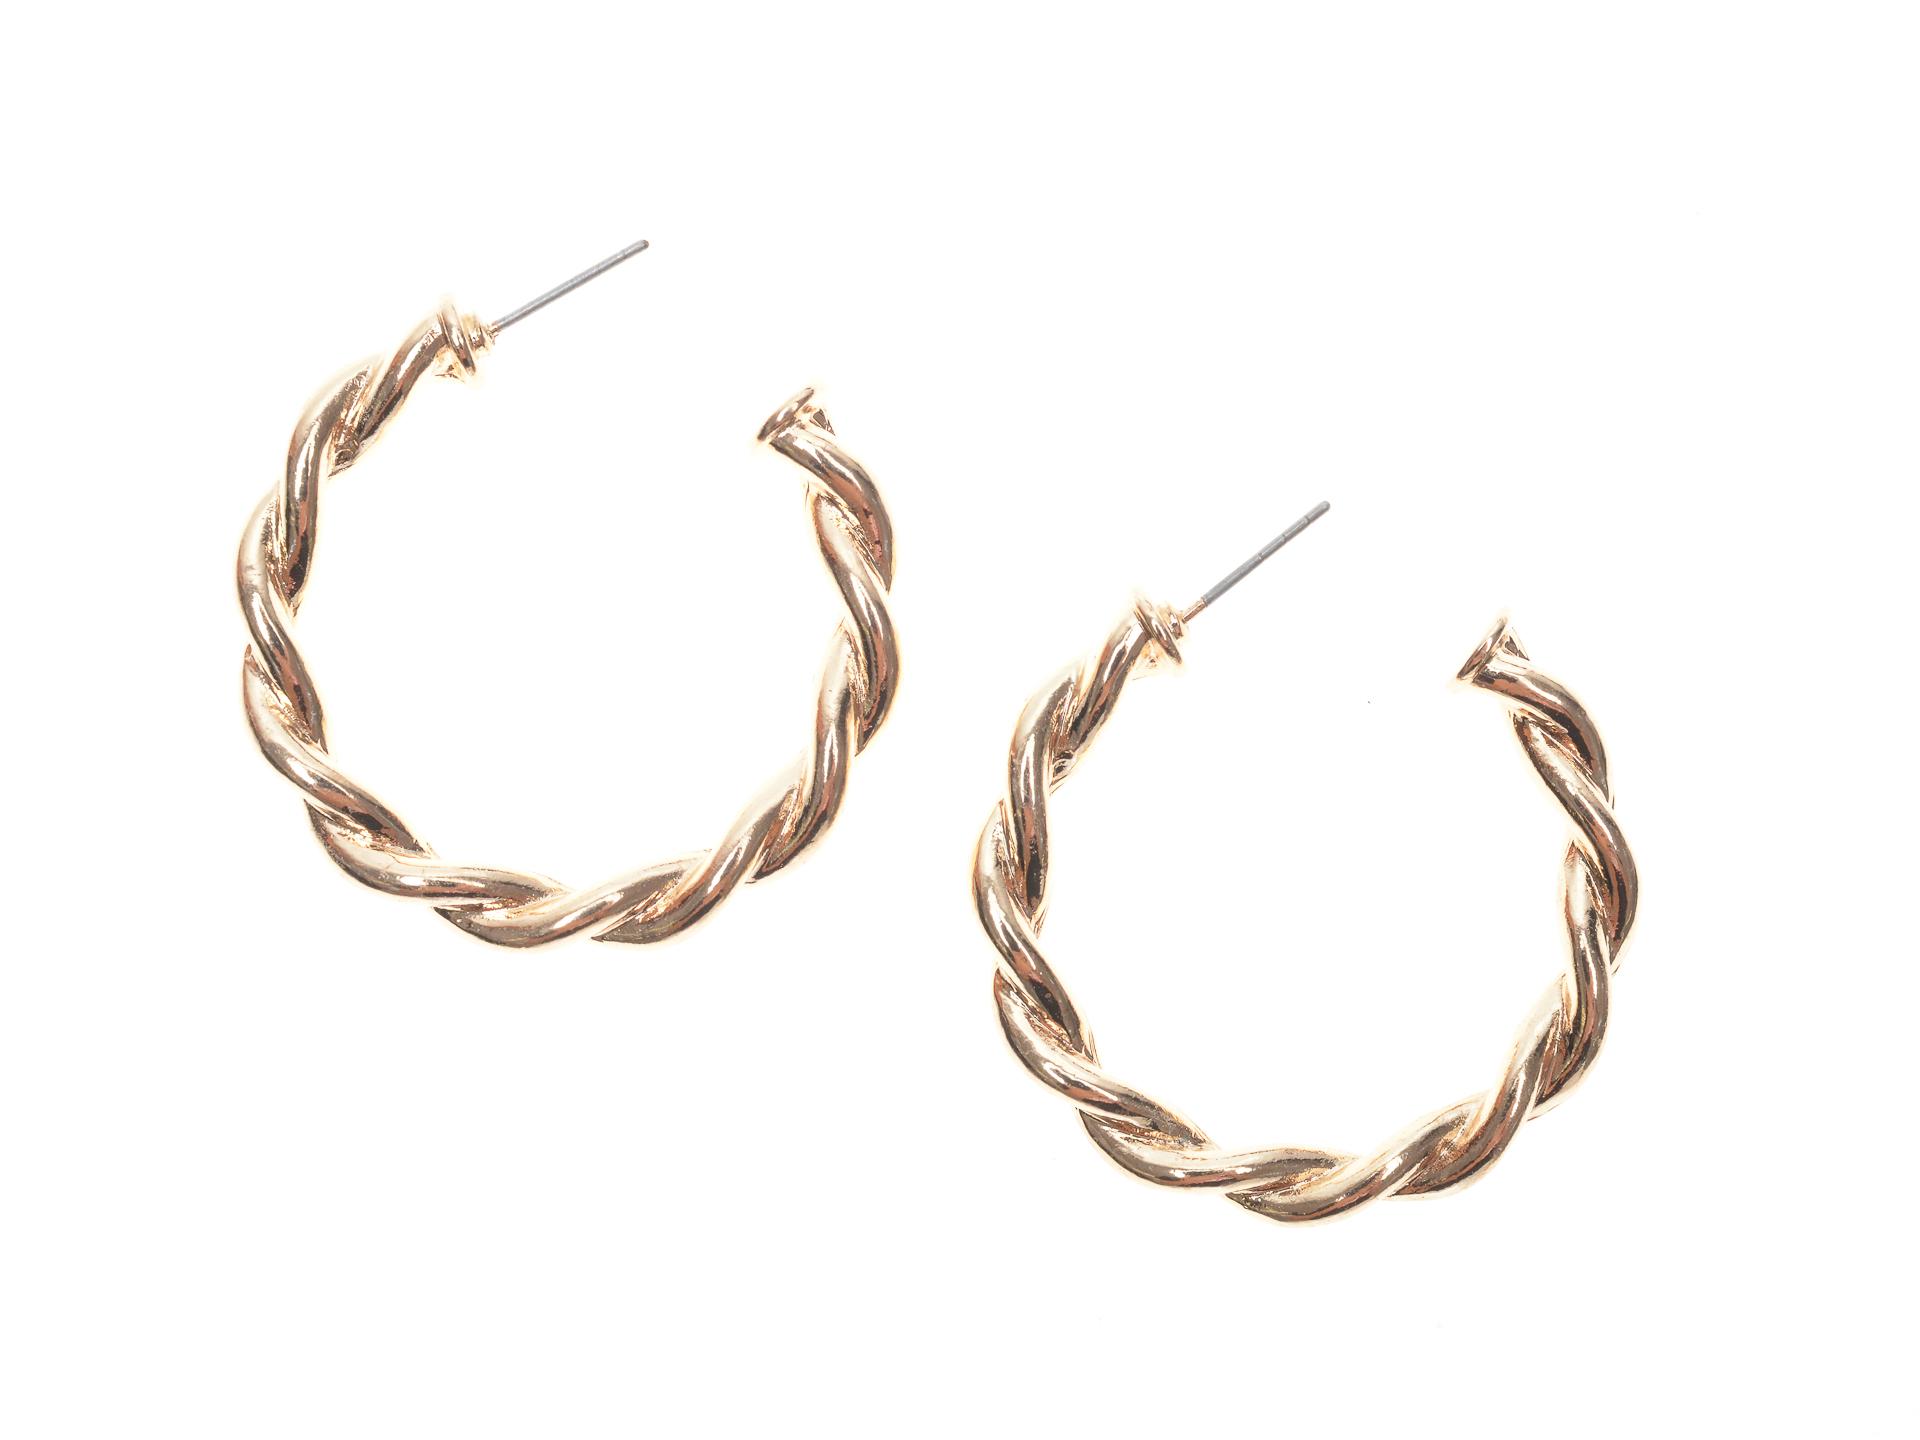 Cercei ALDO aurii, Bruggema710, din metal